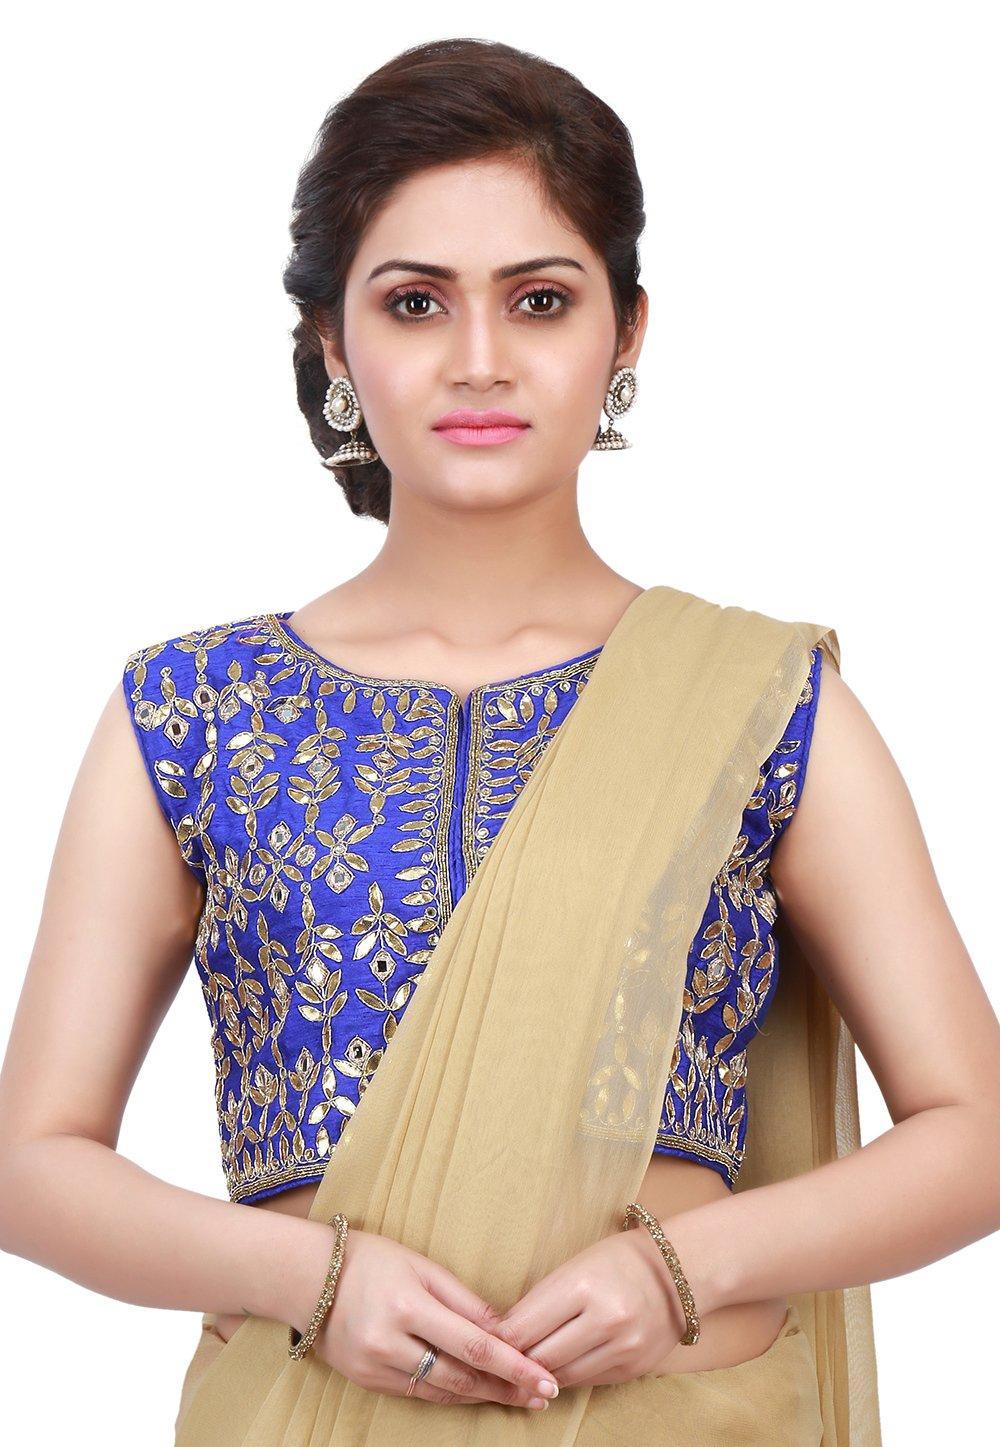 Utsav Fashion Embroidered Dupion Silk Jacket Style Blouse in Indigo